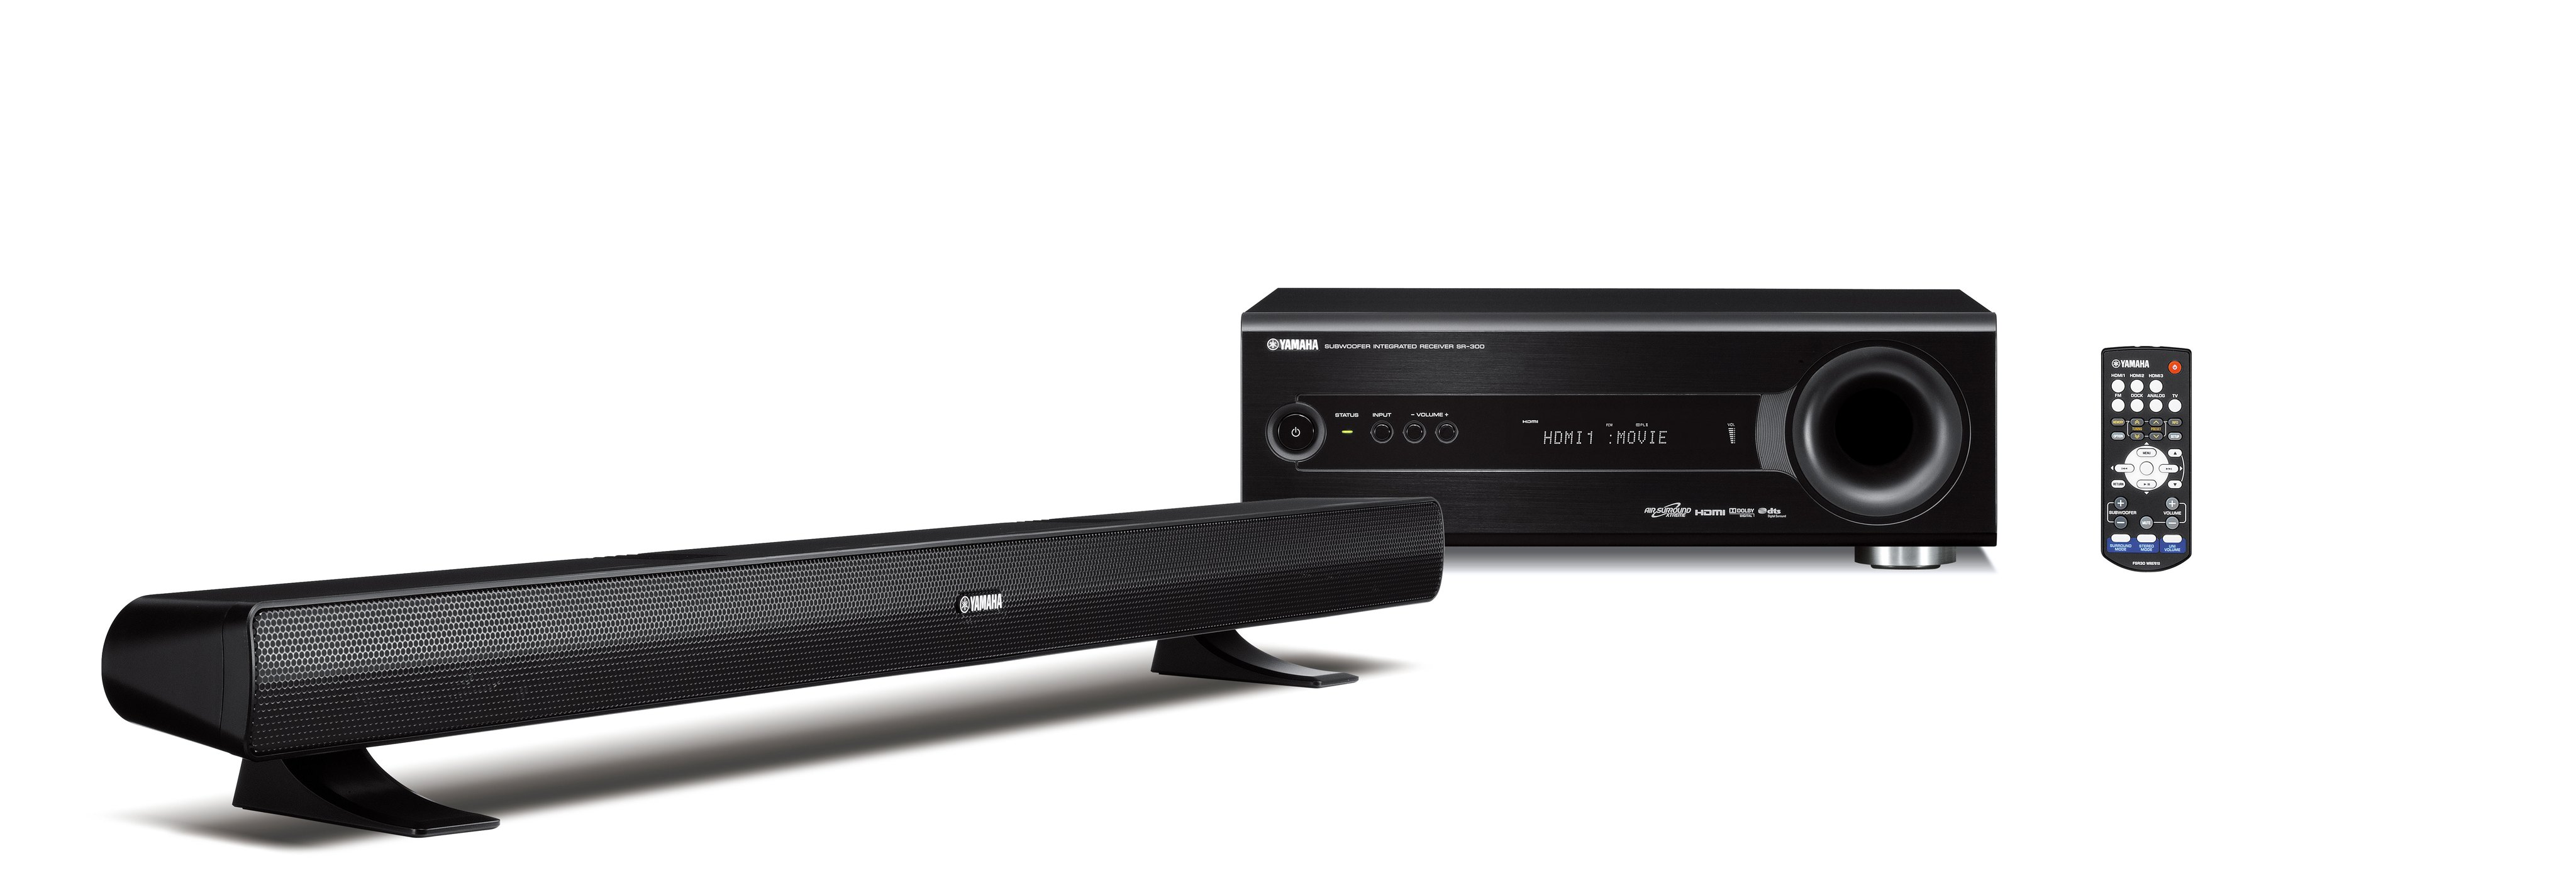 yht s400 overview sound bar audio visual products yamaha rh europe yamaha com yamaha yht-s400 manual Bar Yht Surround Yamaha S400bl